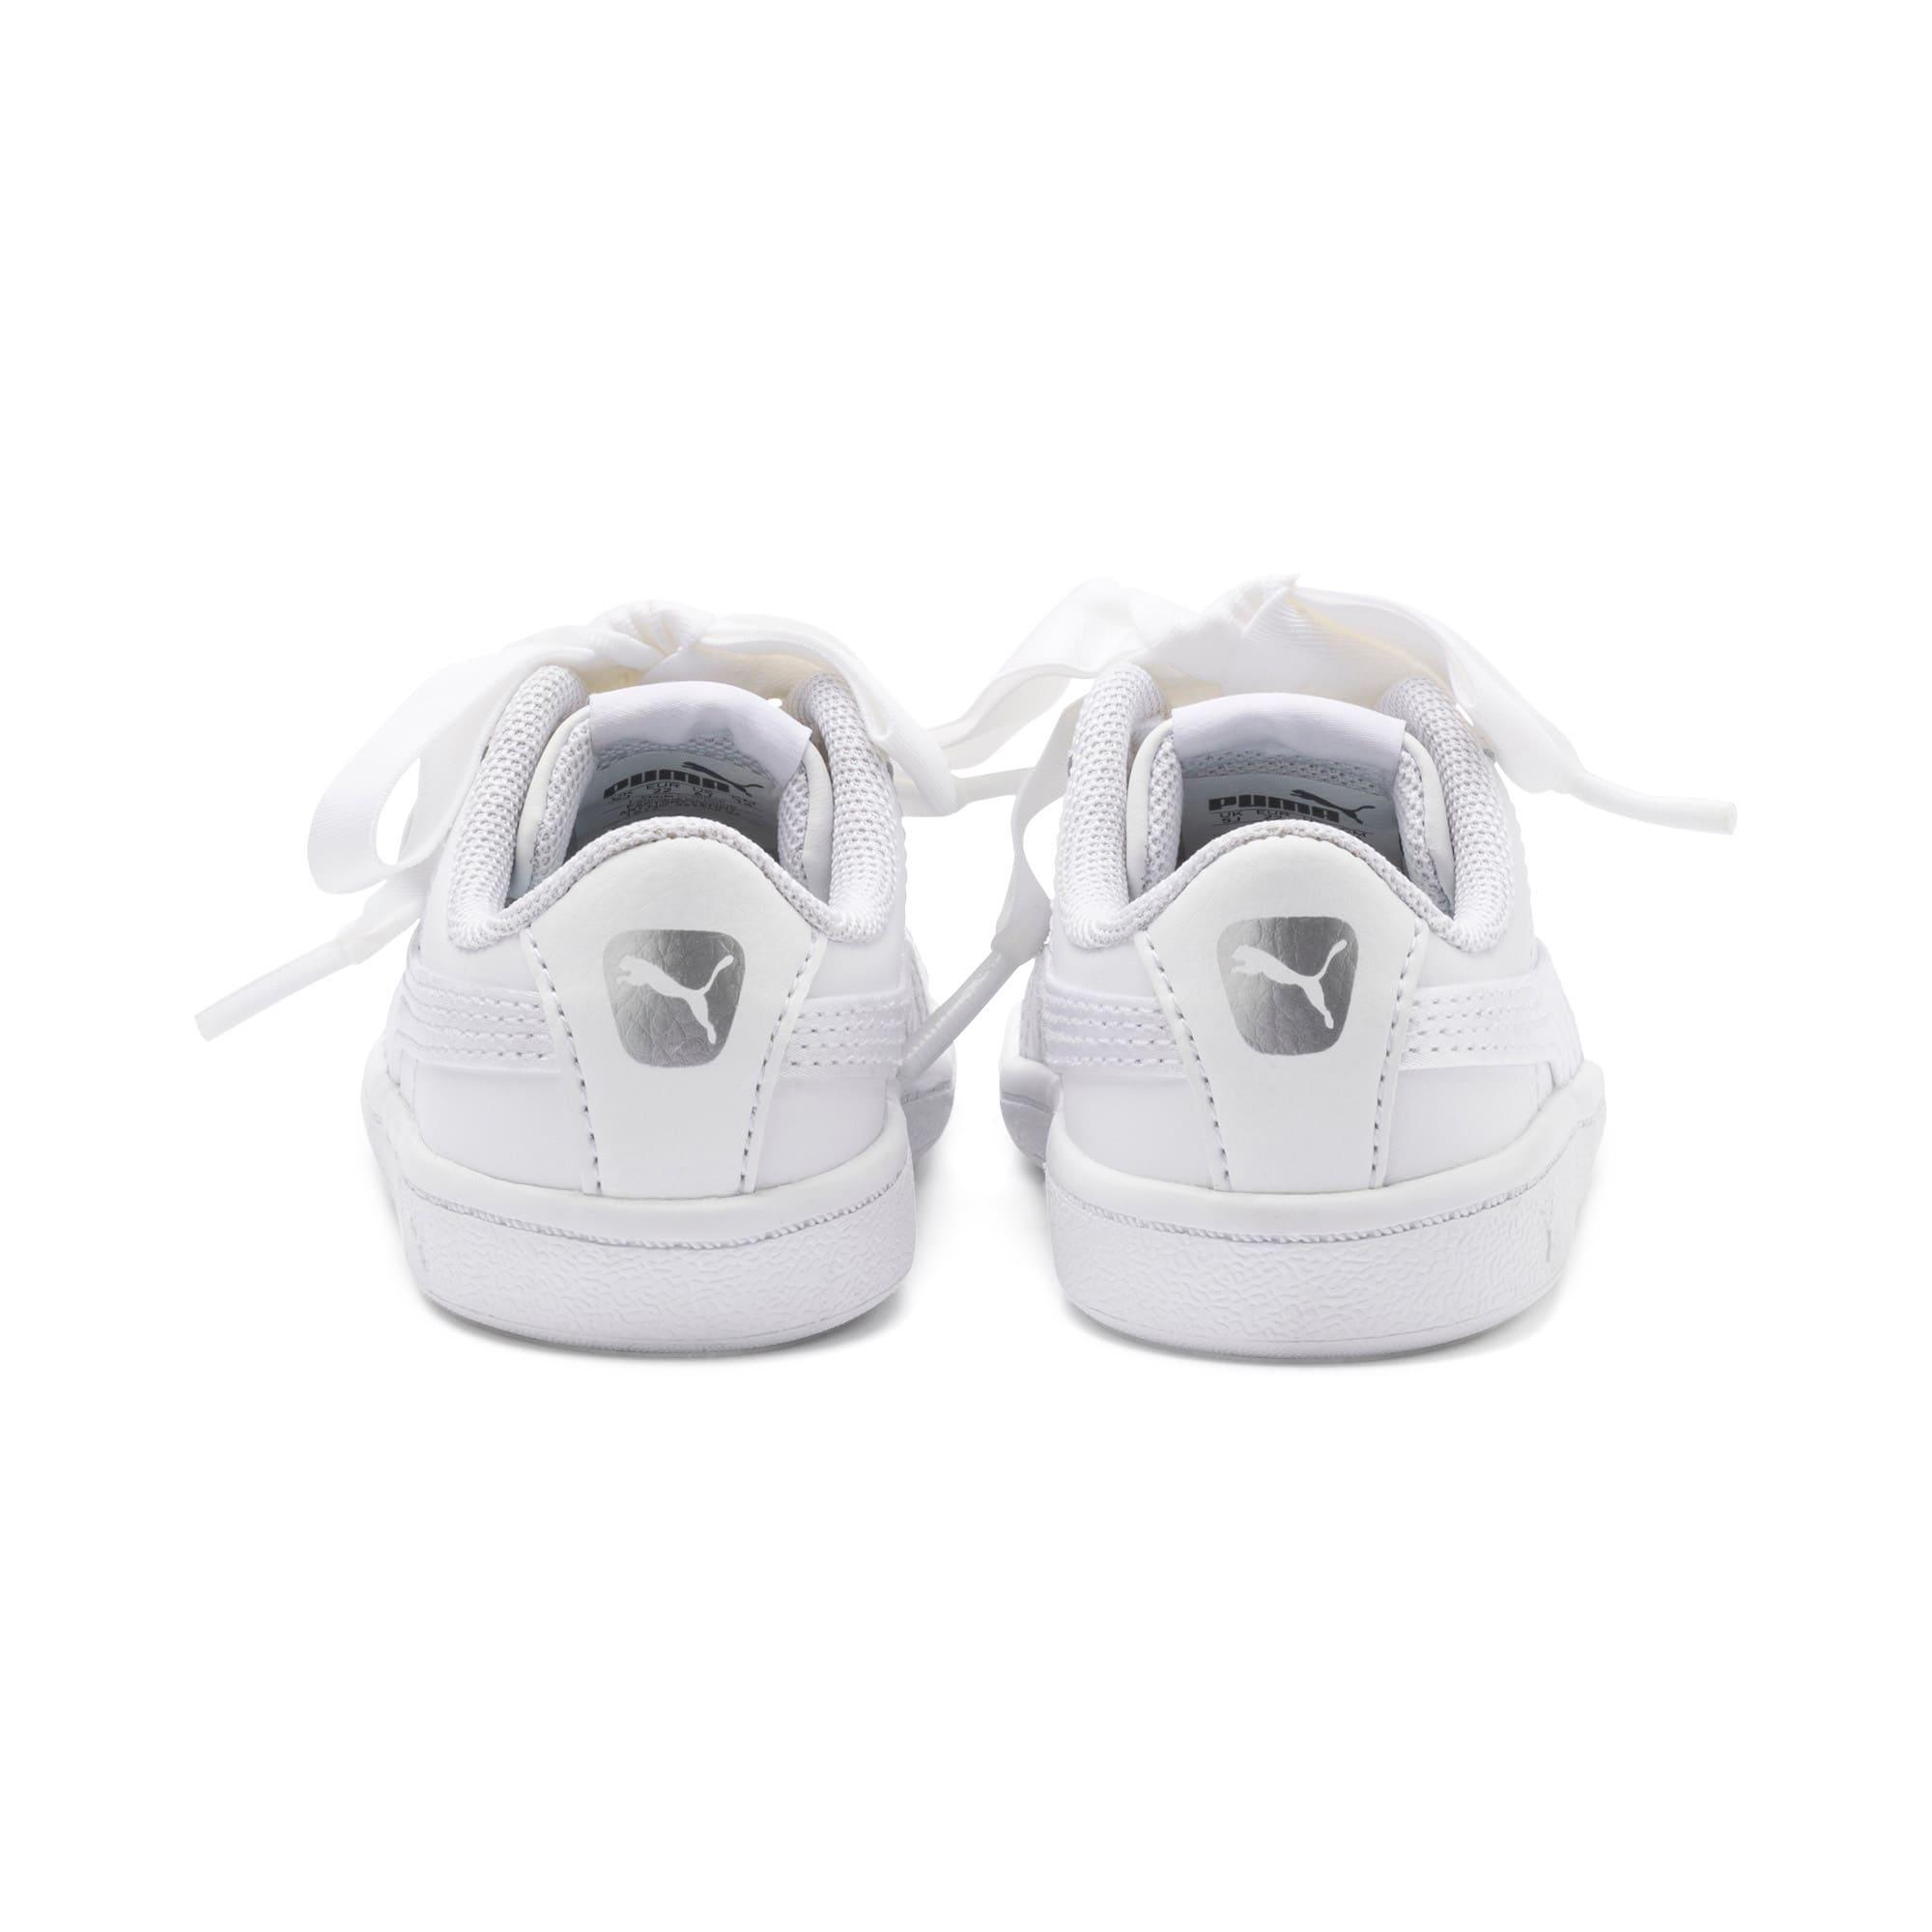 Miniatura 3 de ZapatosPUMA Vikky Ribbon Satin AC para bebés, Puma White-Puma White, mediano